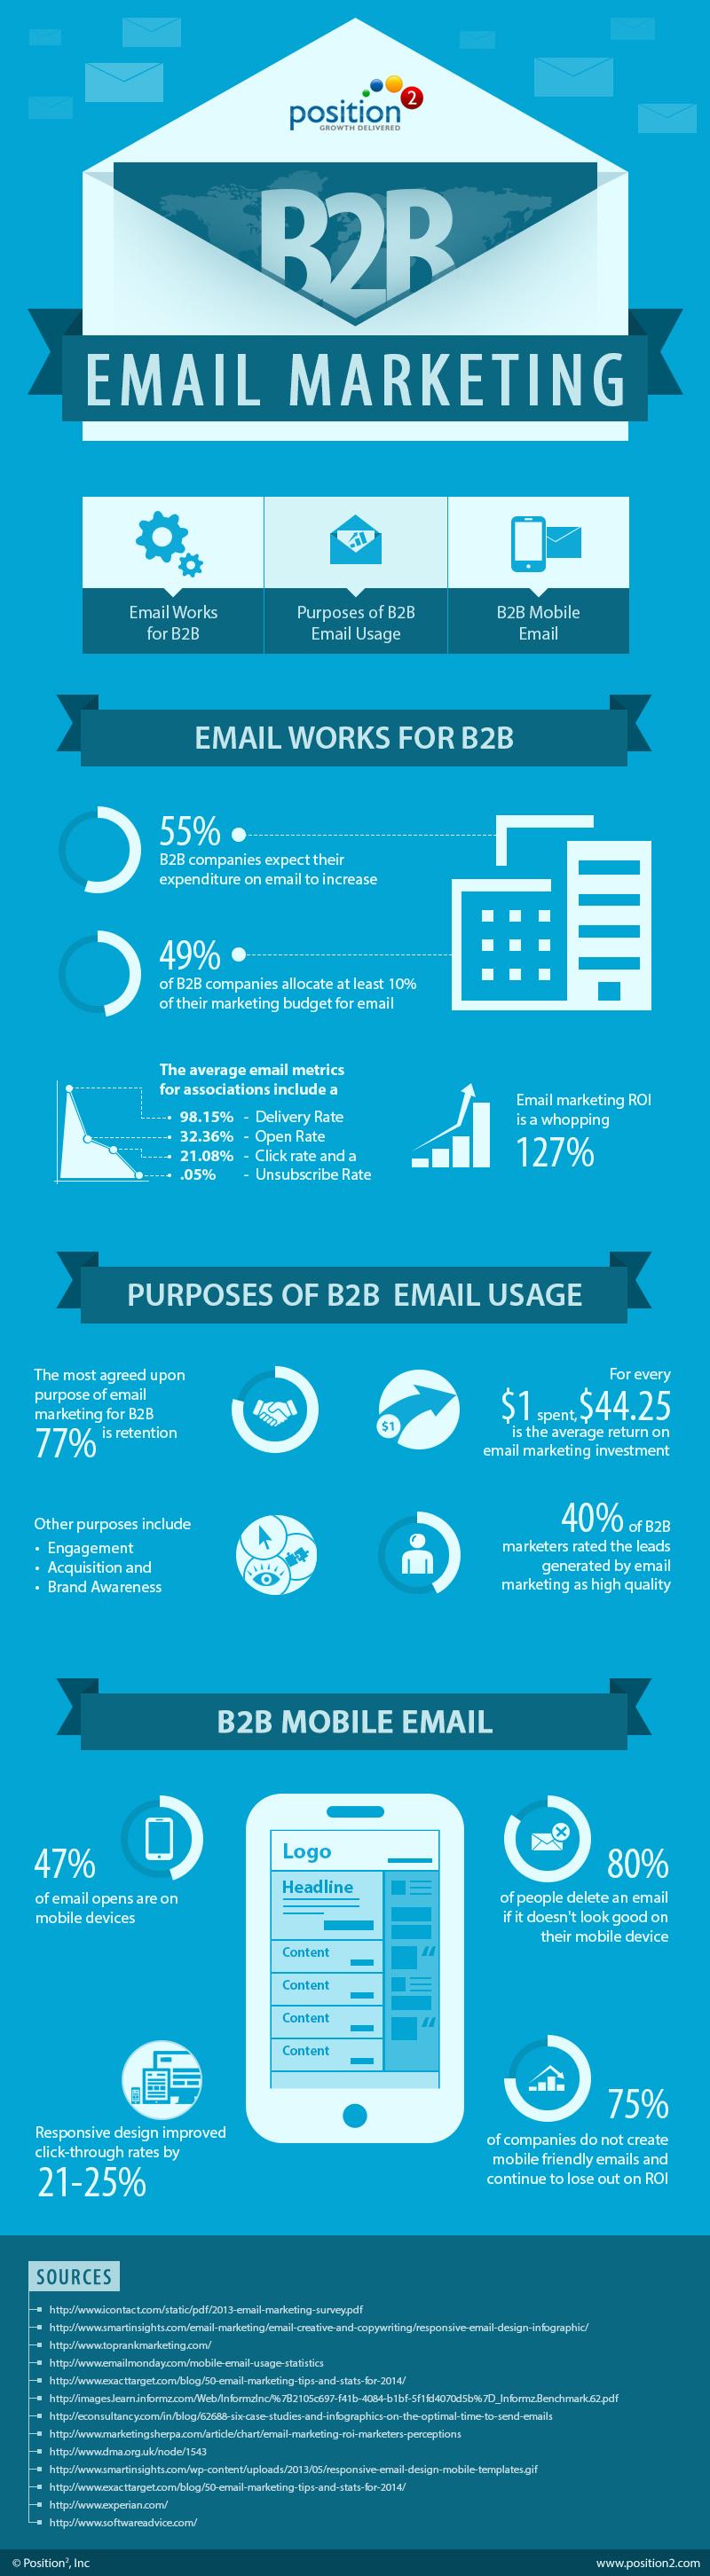 Infographic_B2B_Email_Marketing_120413-1